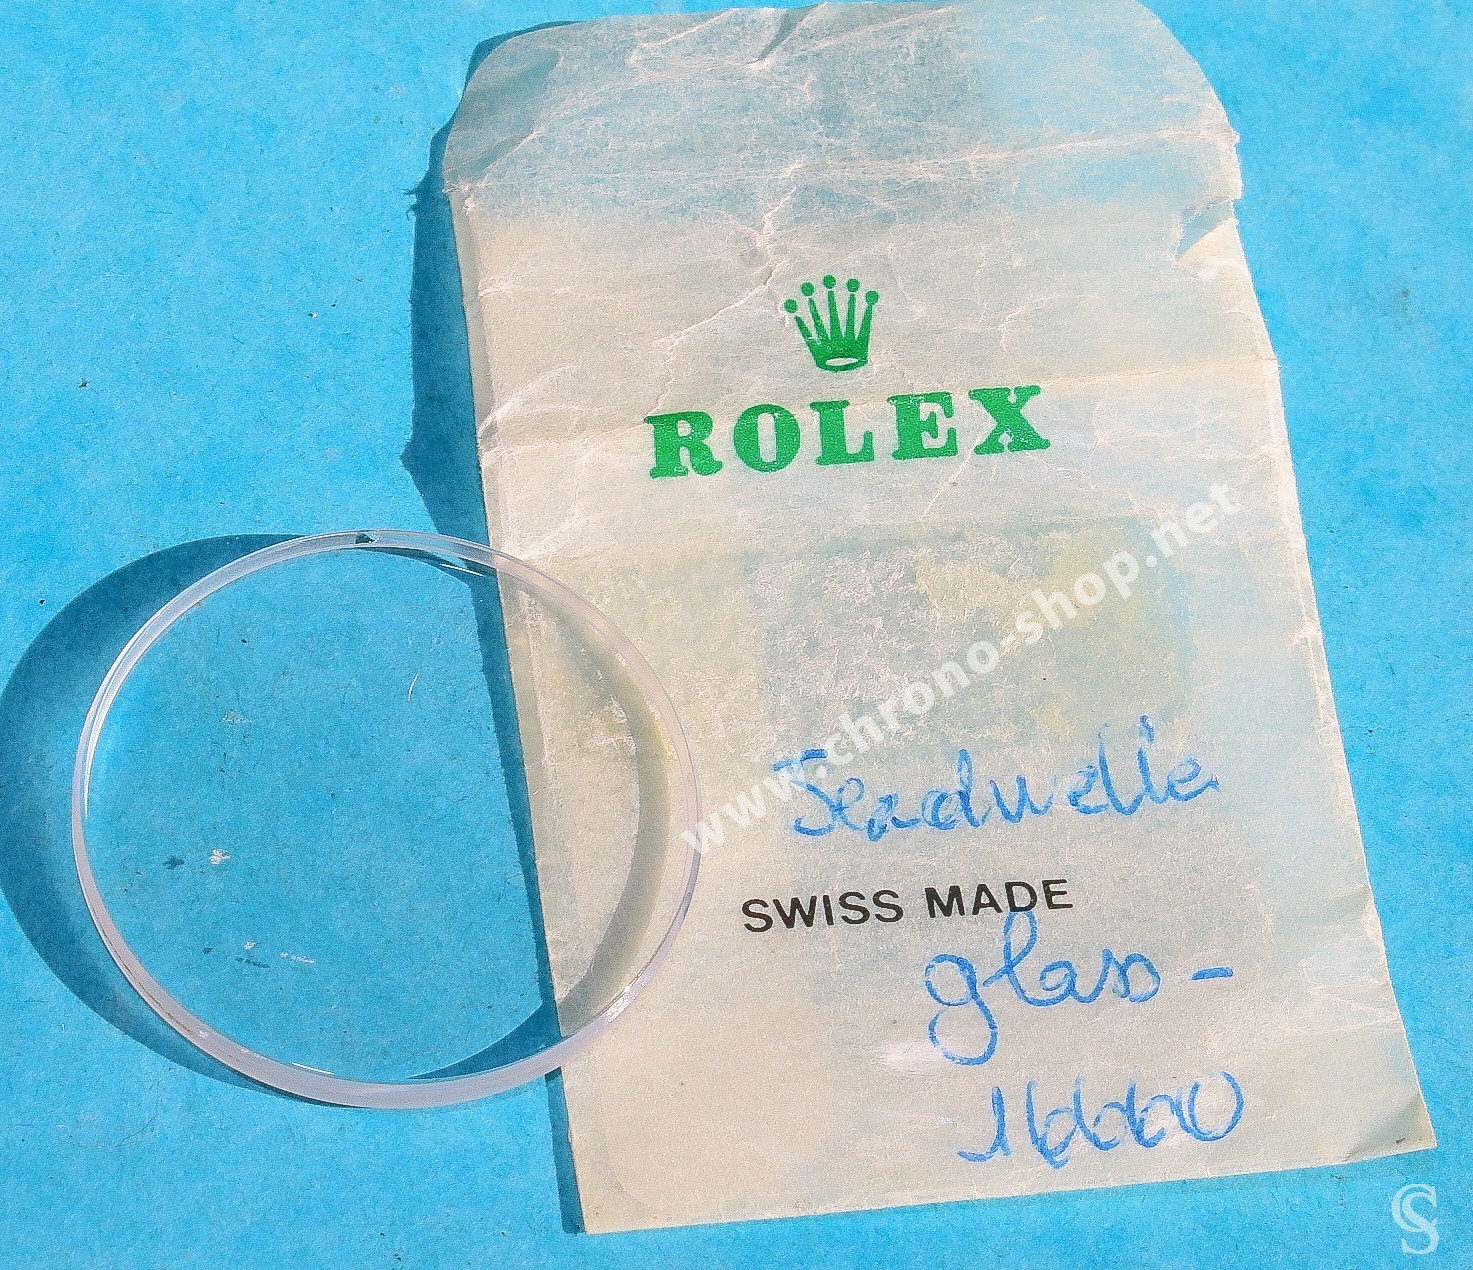 ROLEX ORIGINALE GLACE VERRE SAPHIR ref 25-285 MONTRES ROLEX SEA-DWELLER 16660, 16600